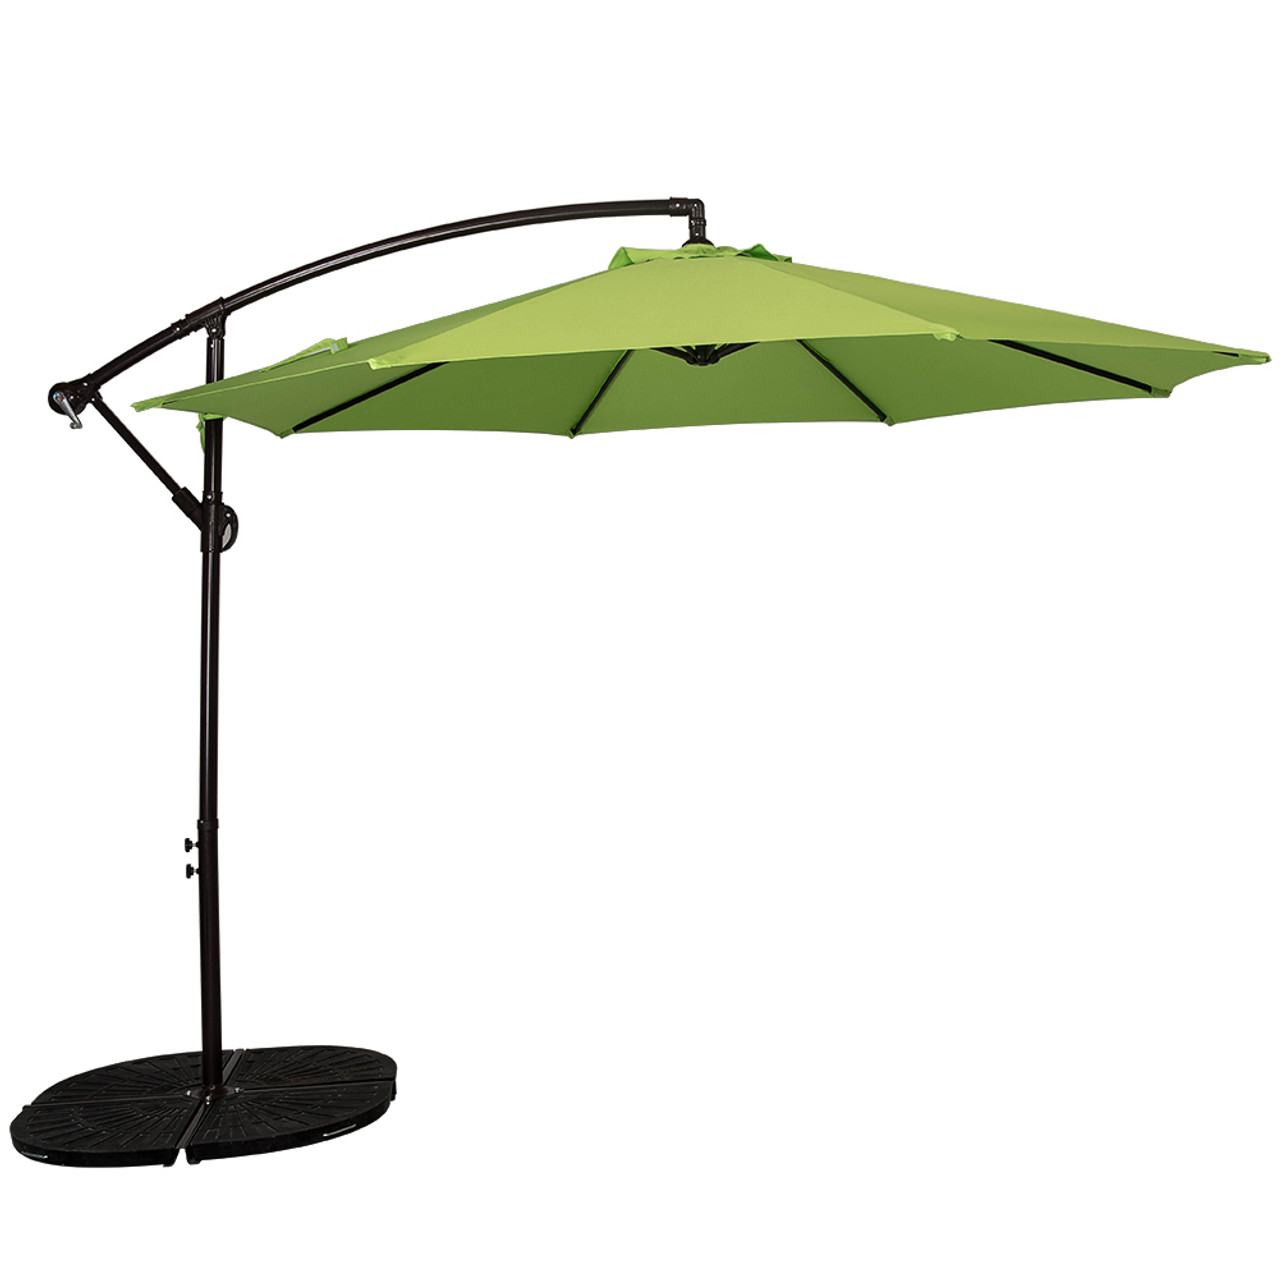 Superior 10 Feet Aluminum Offset Patio Umbrella With Crank(Apple Green)